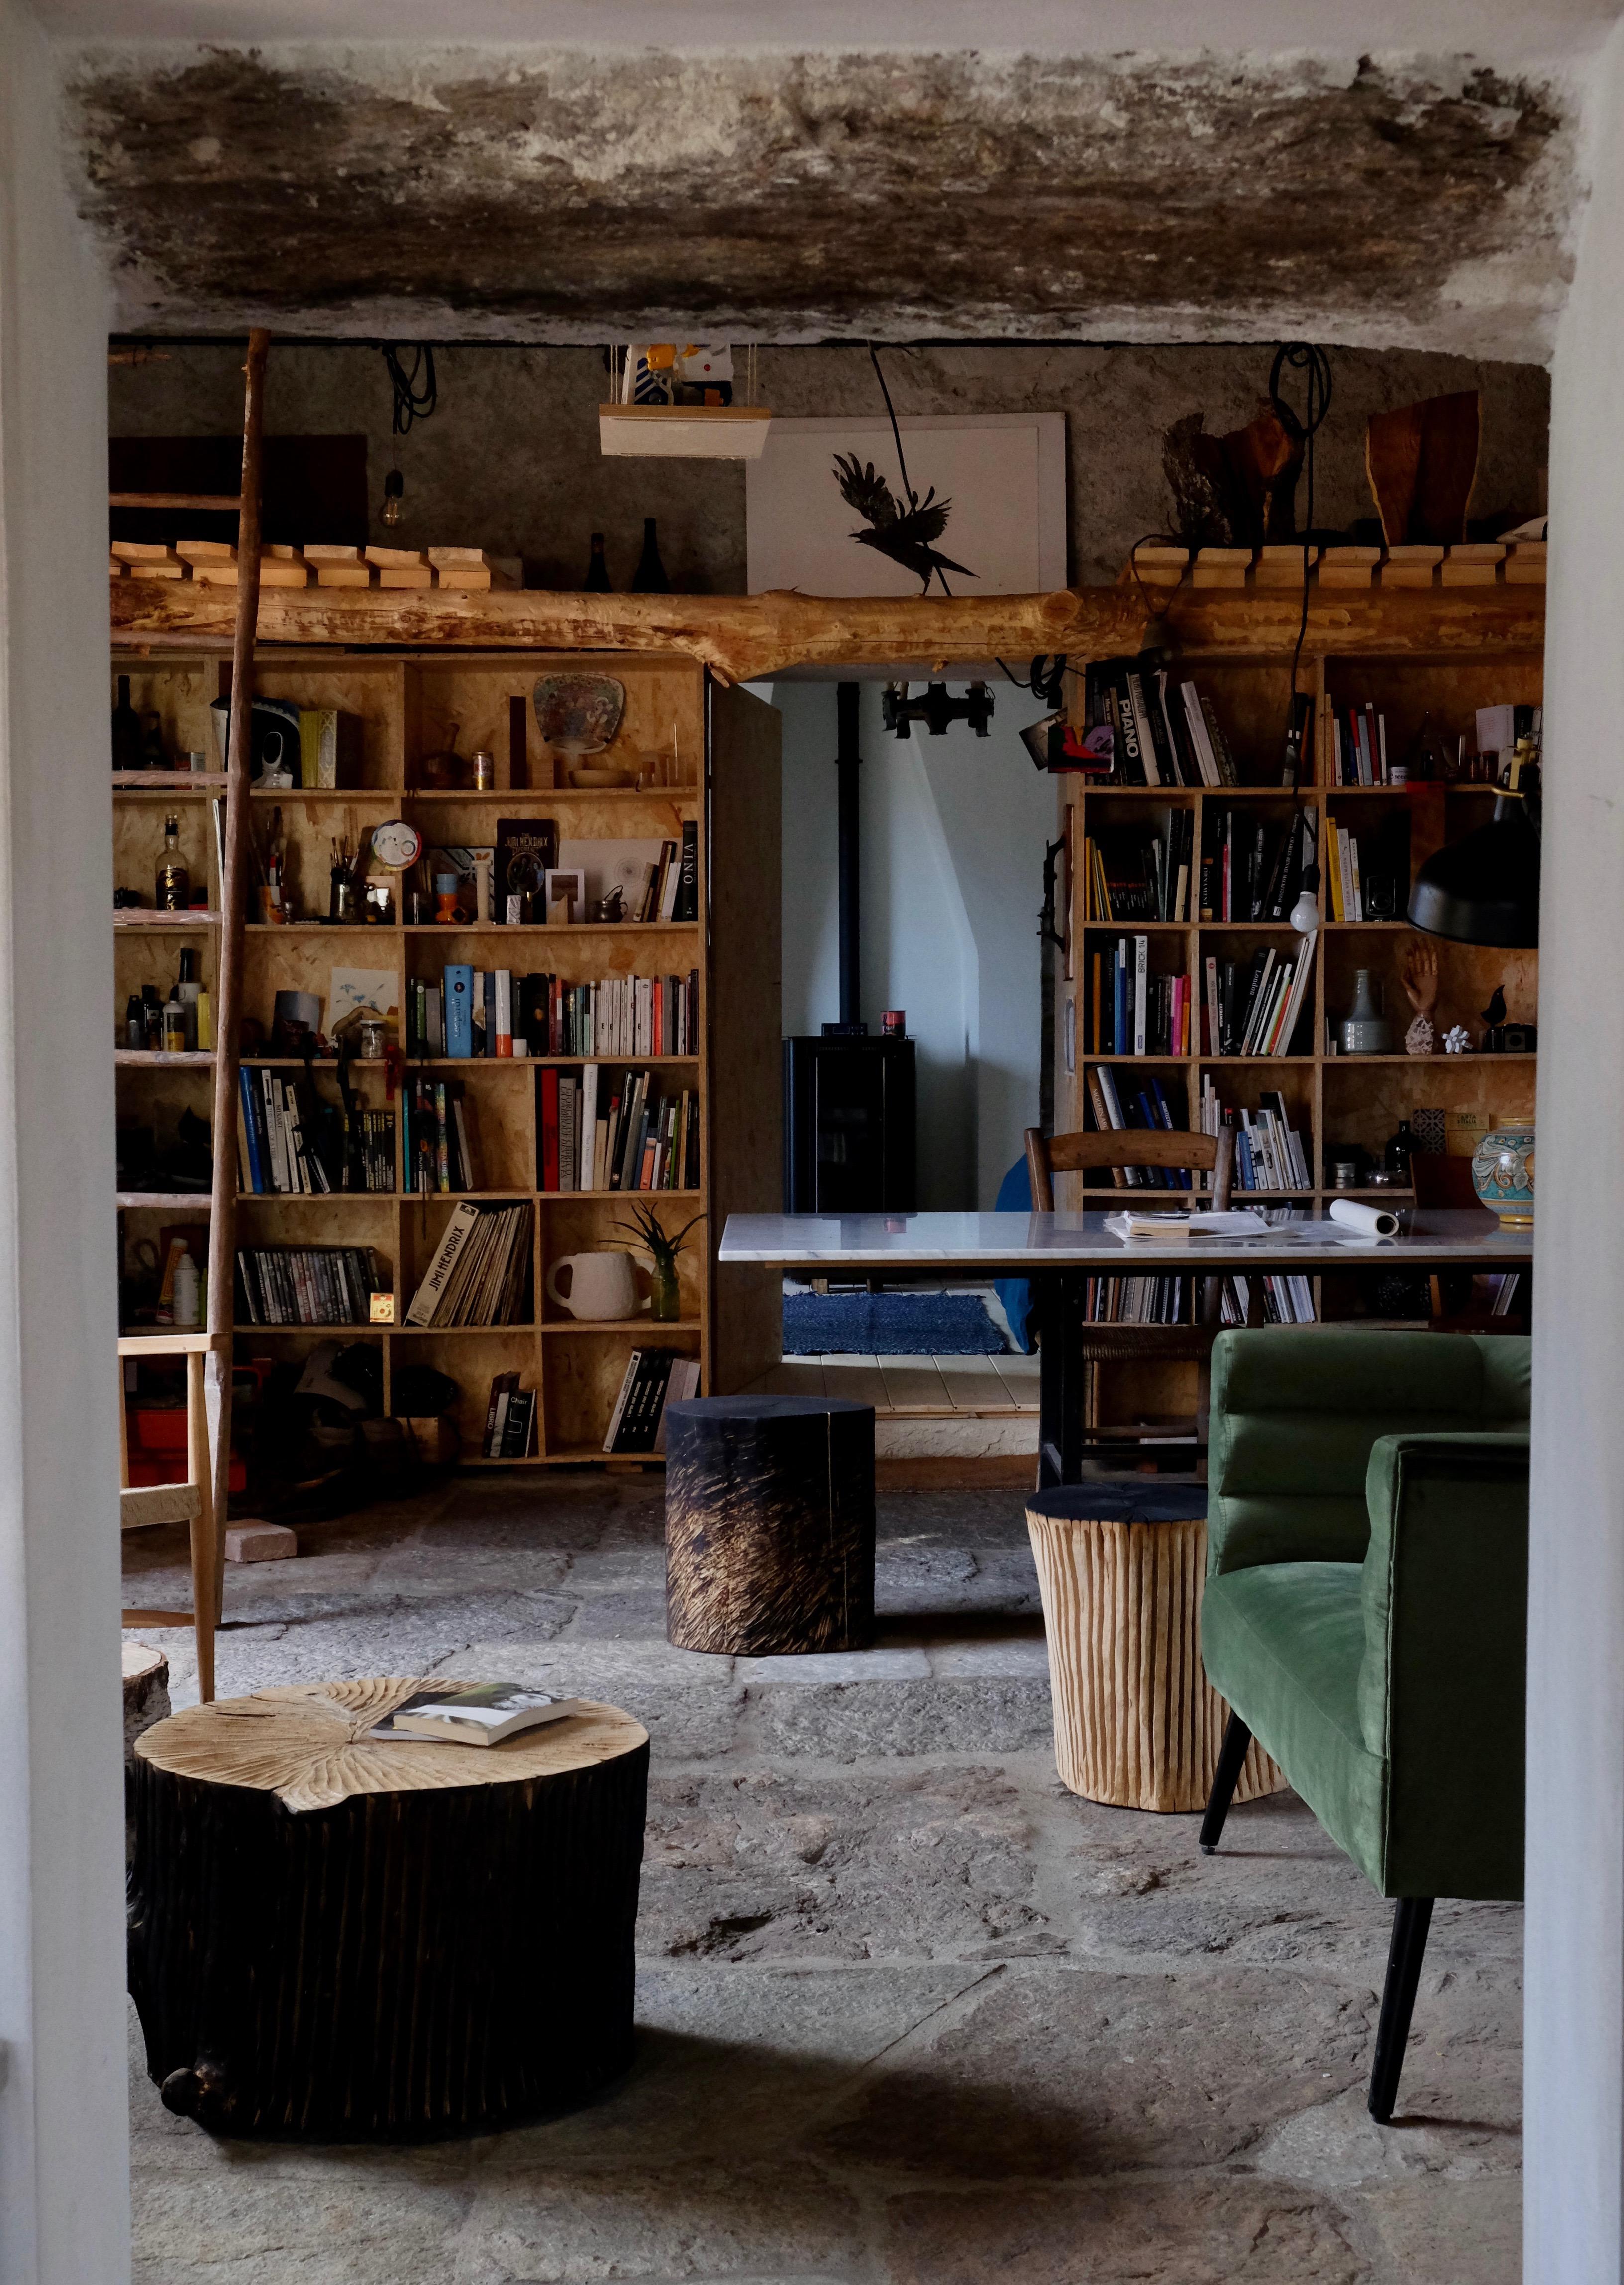 riccardo-monte-workshop